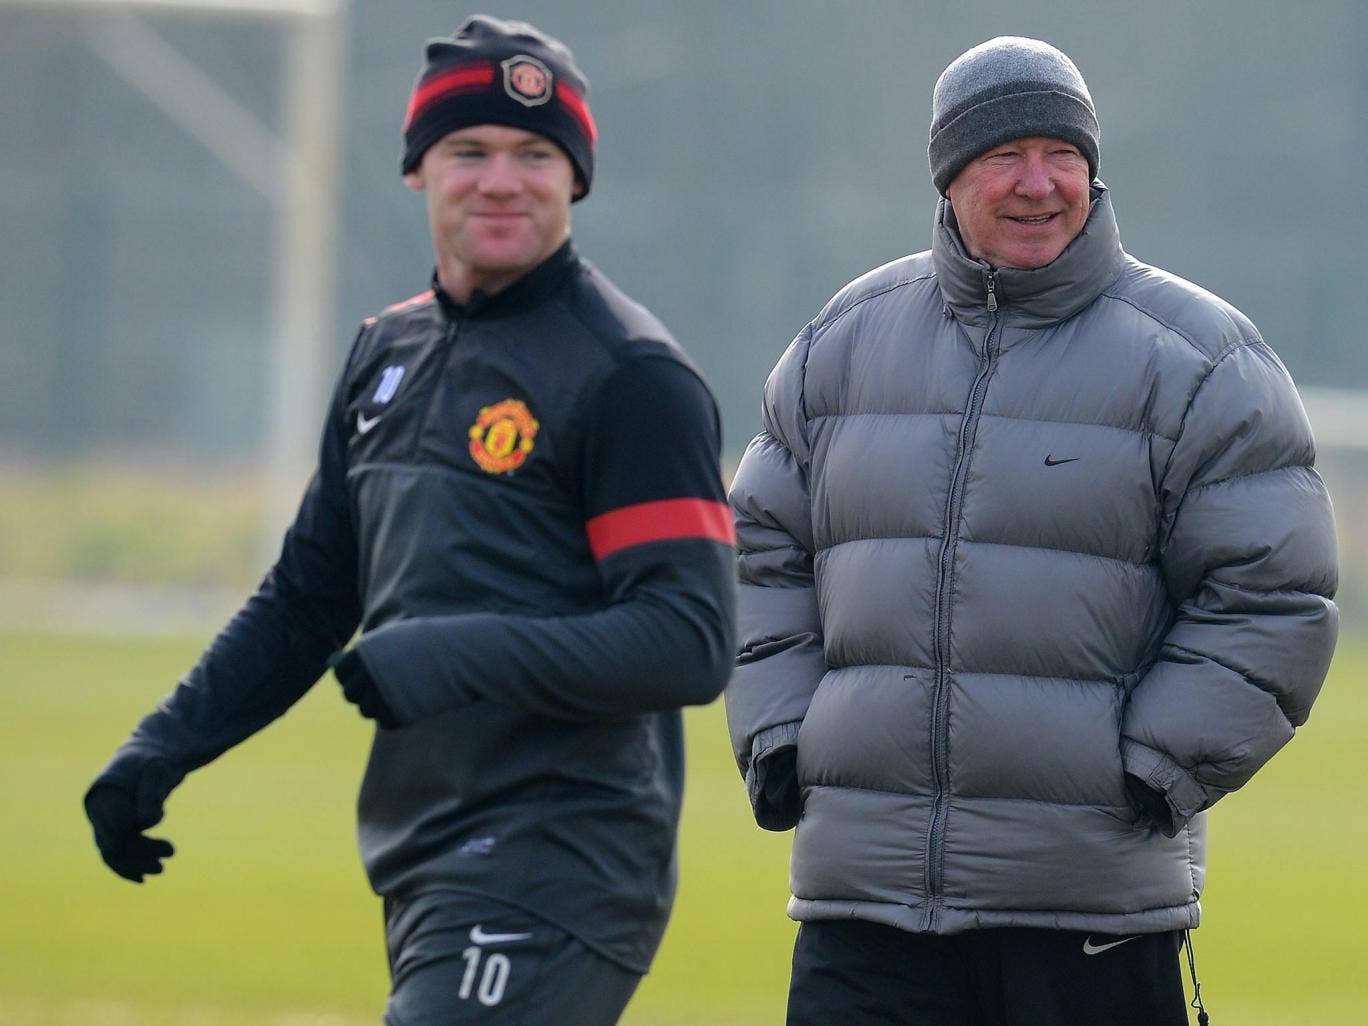 Wayne Rooney and Alex Ferguson in training